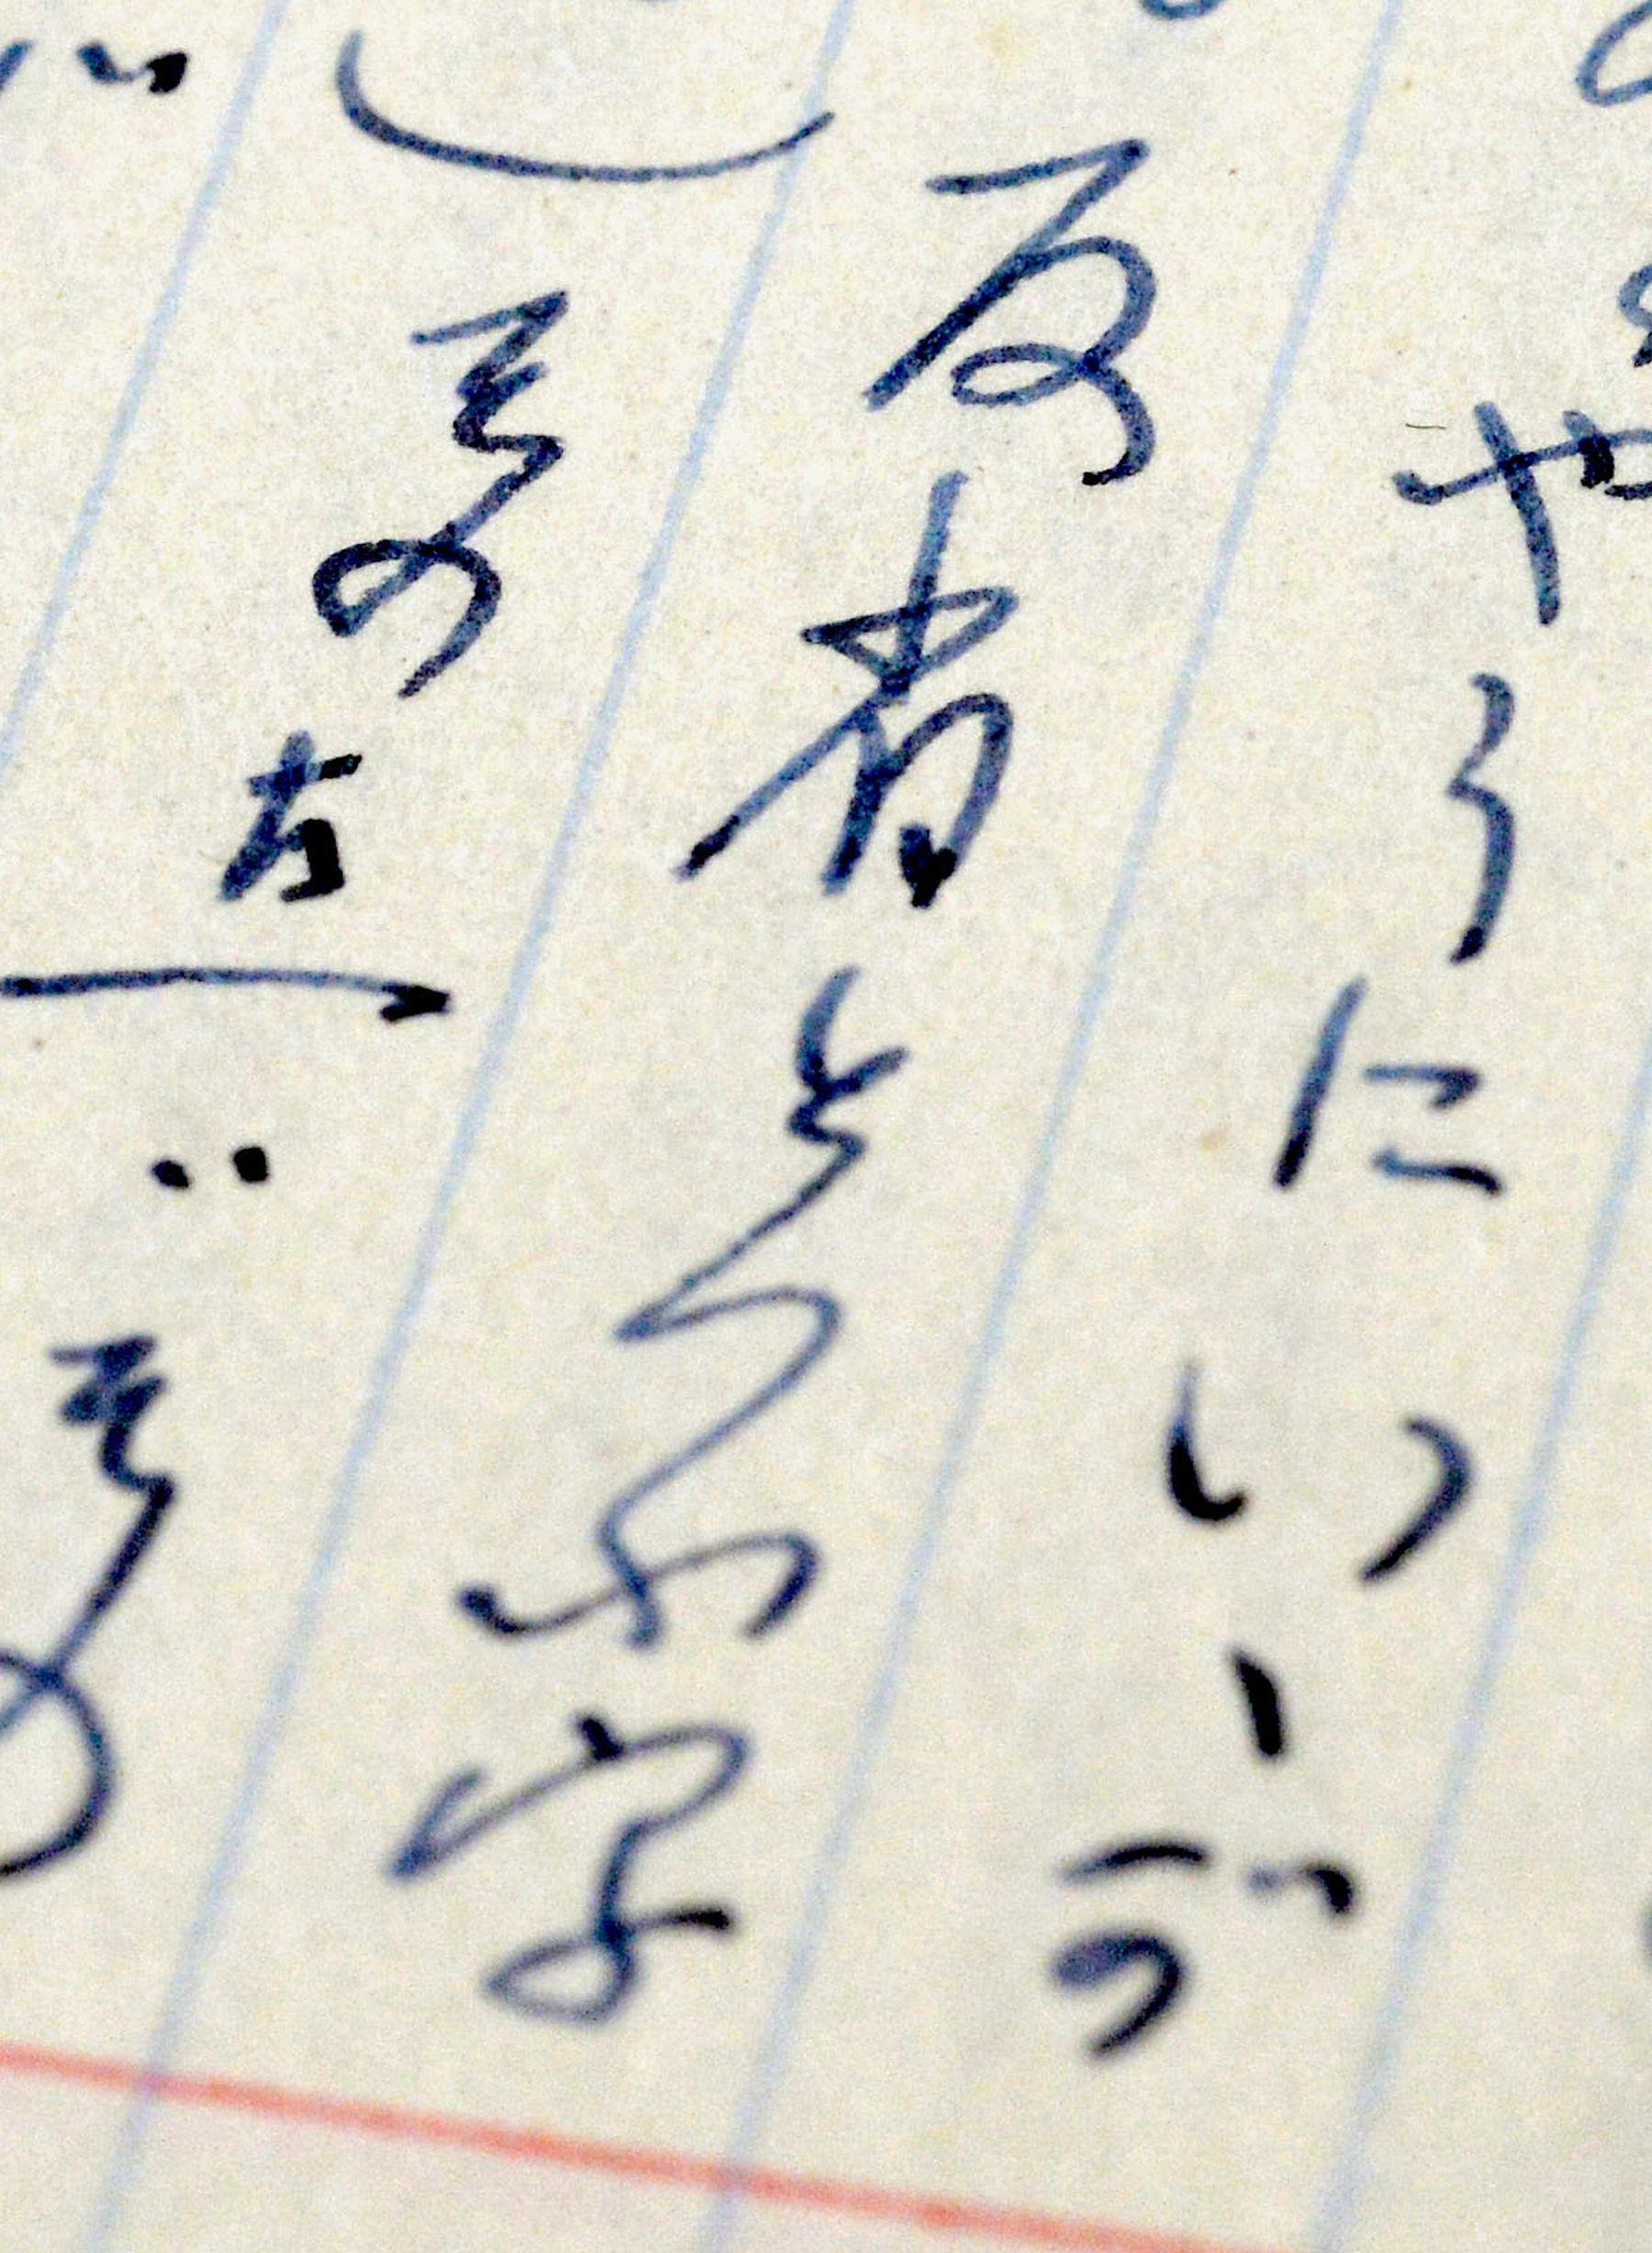 Emperor Showa Favored Japans Rearmament, Documents Reveal 010